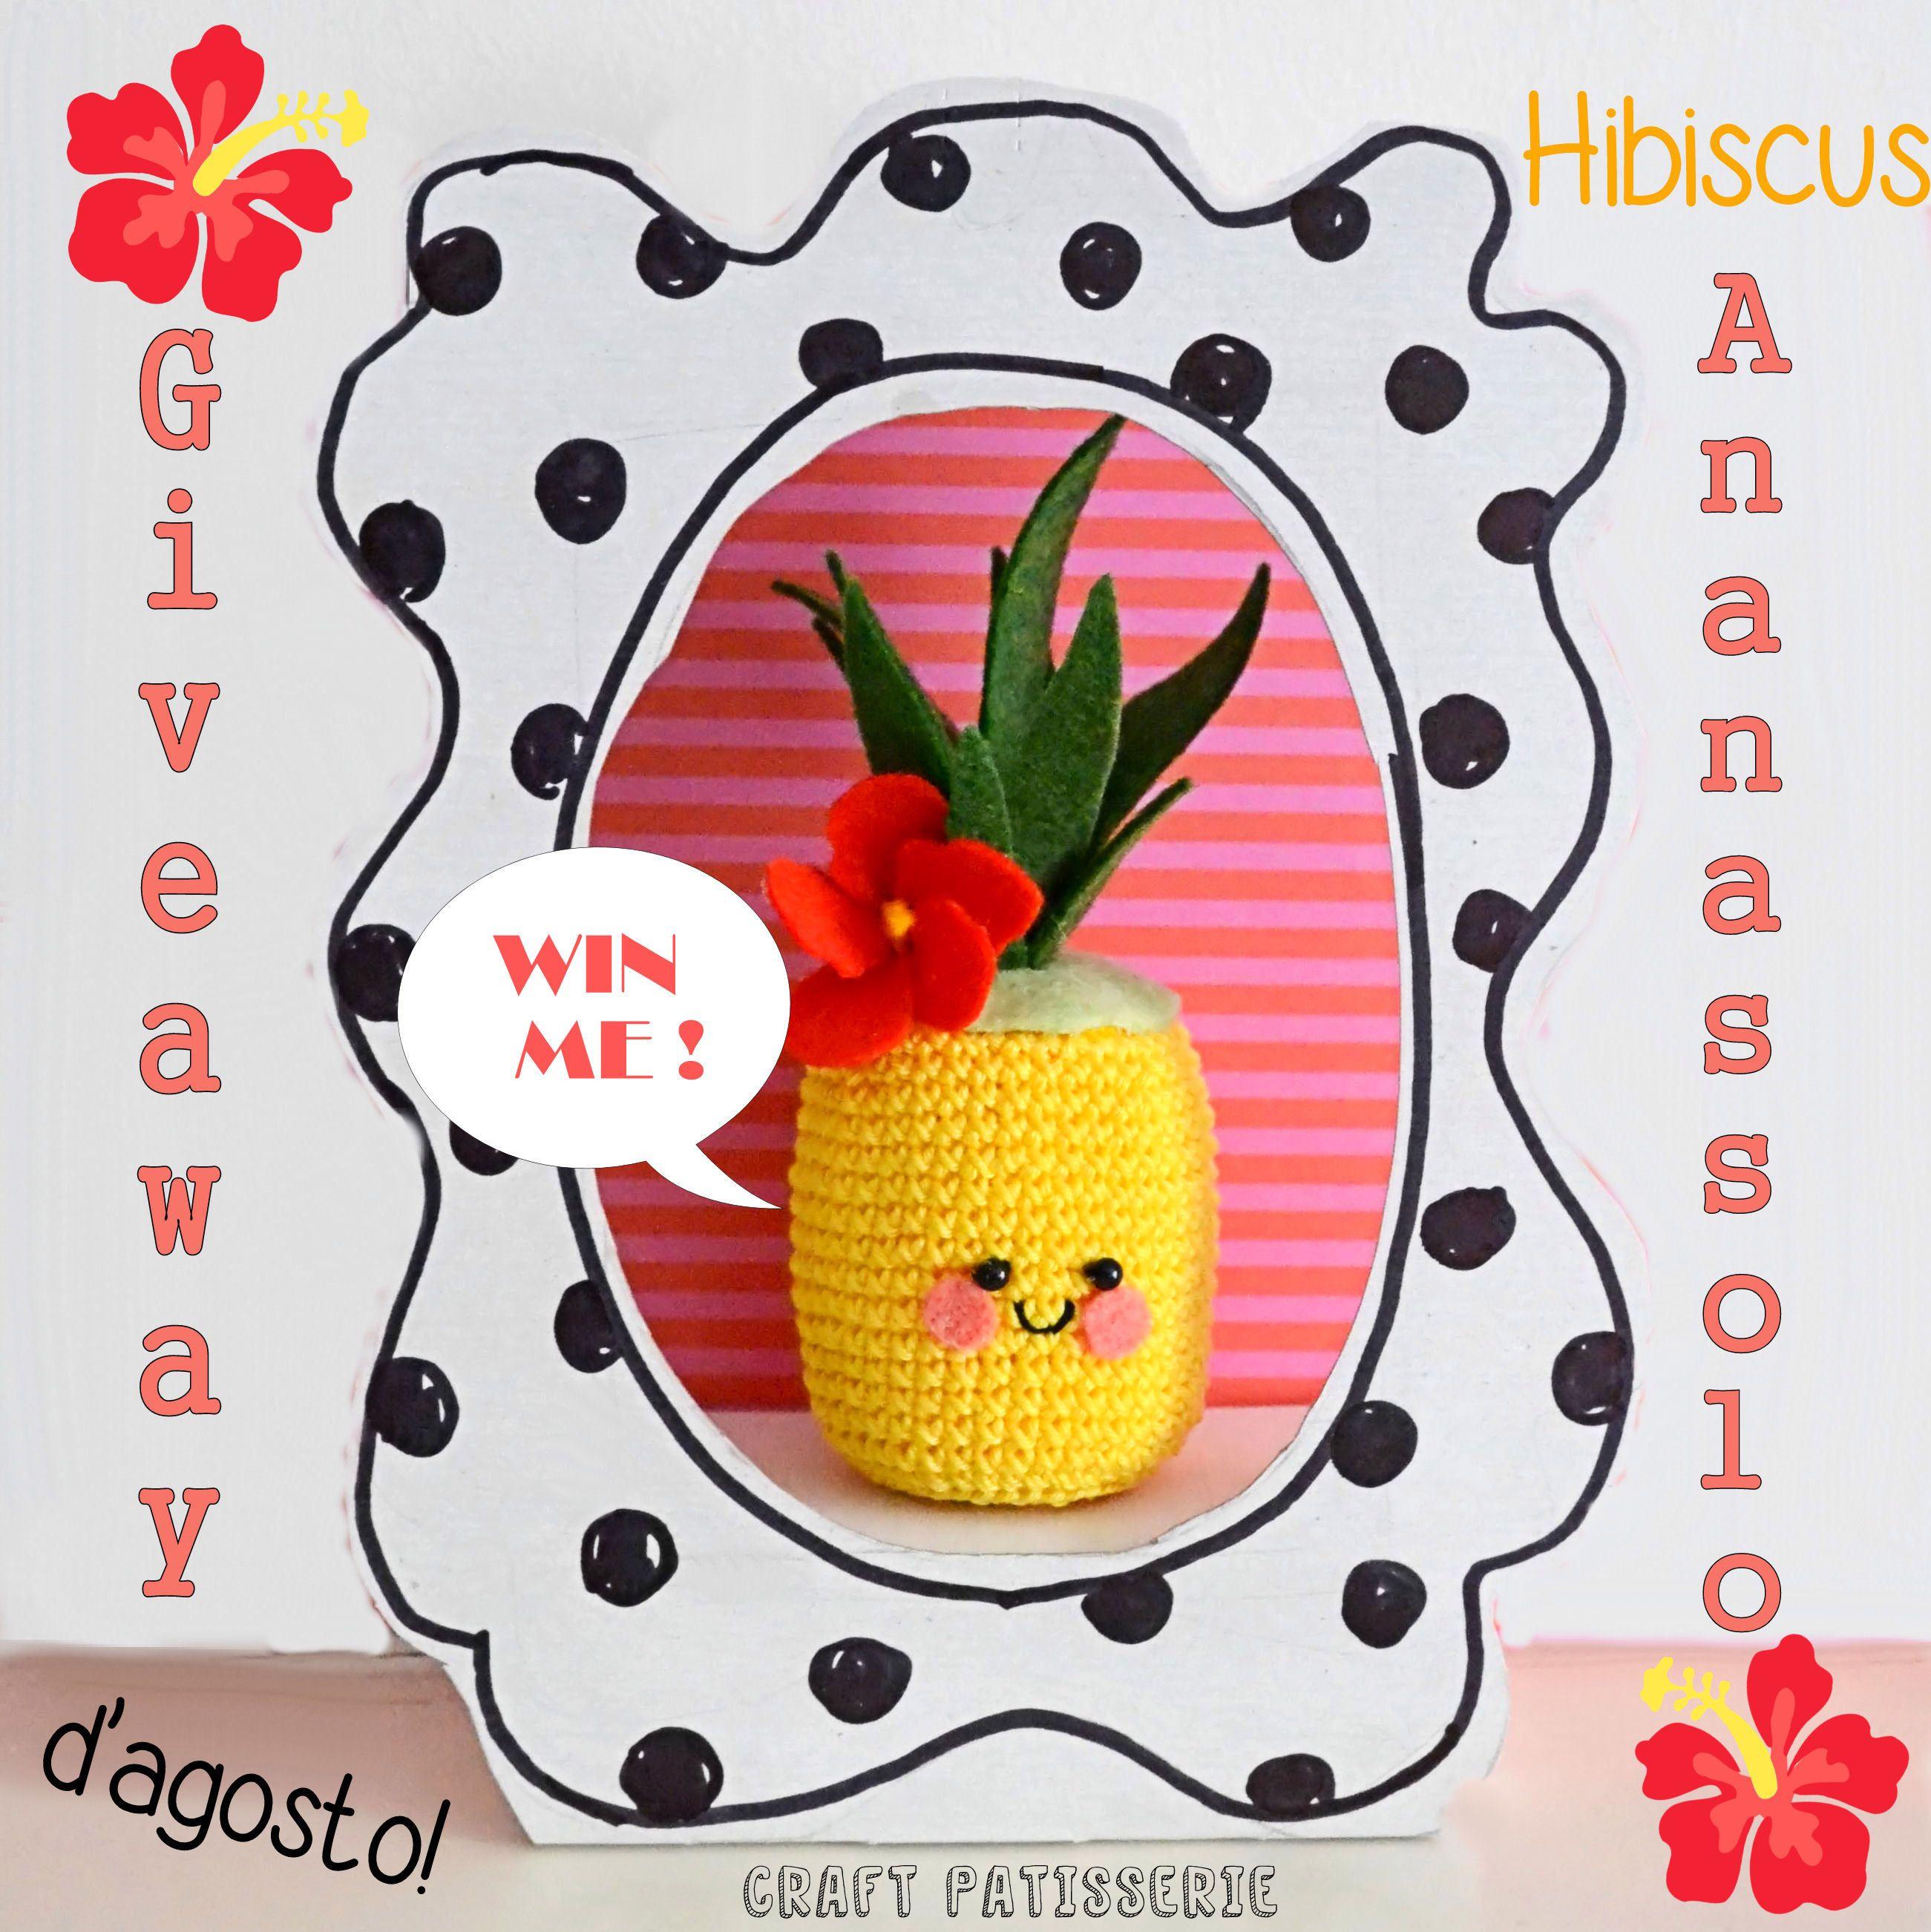 Summer 2015...win an Hibiscus ANANASSOLO! IG giveaway by CraftPatisserie. Crochet amigurimi pineapple cute kawaii!